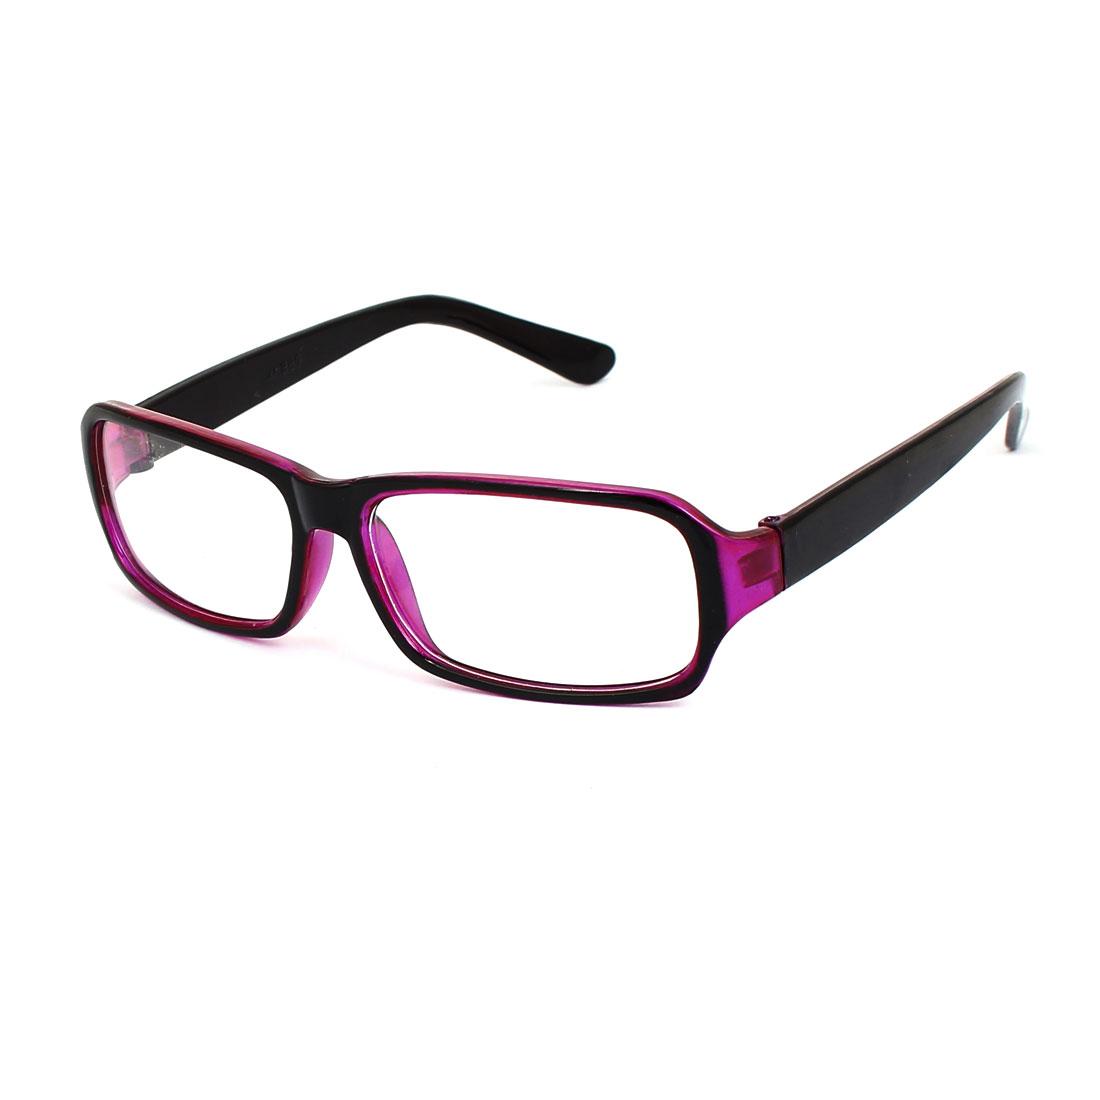 Unisex Square Lens Full Rim Eyewear Plain Plano Glasses Spectacles Black Purple